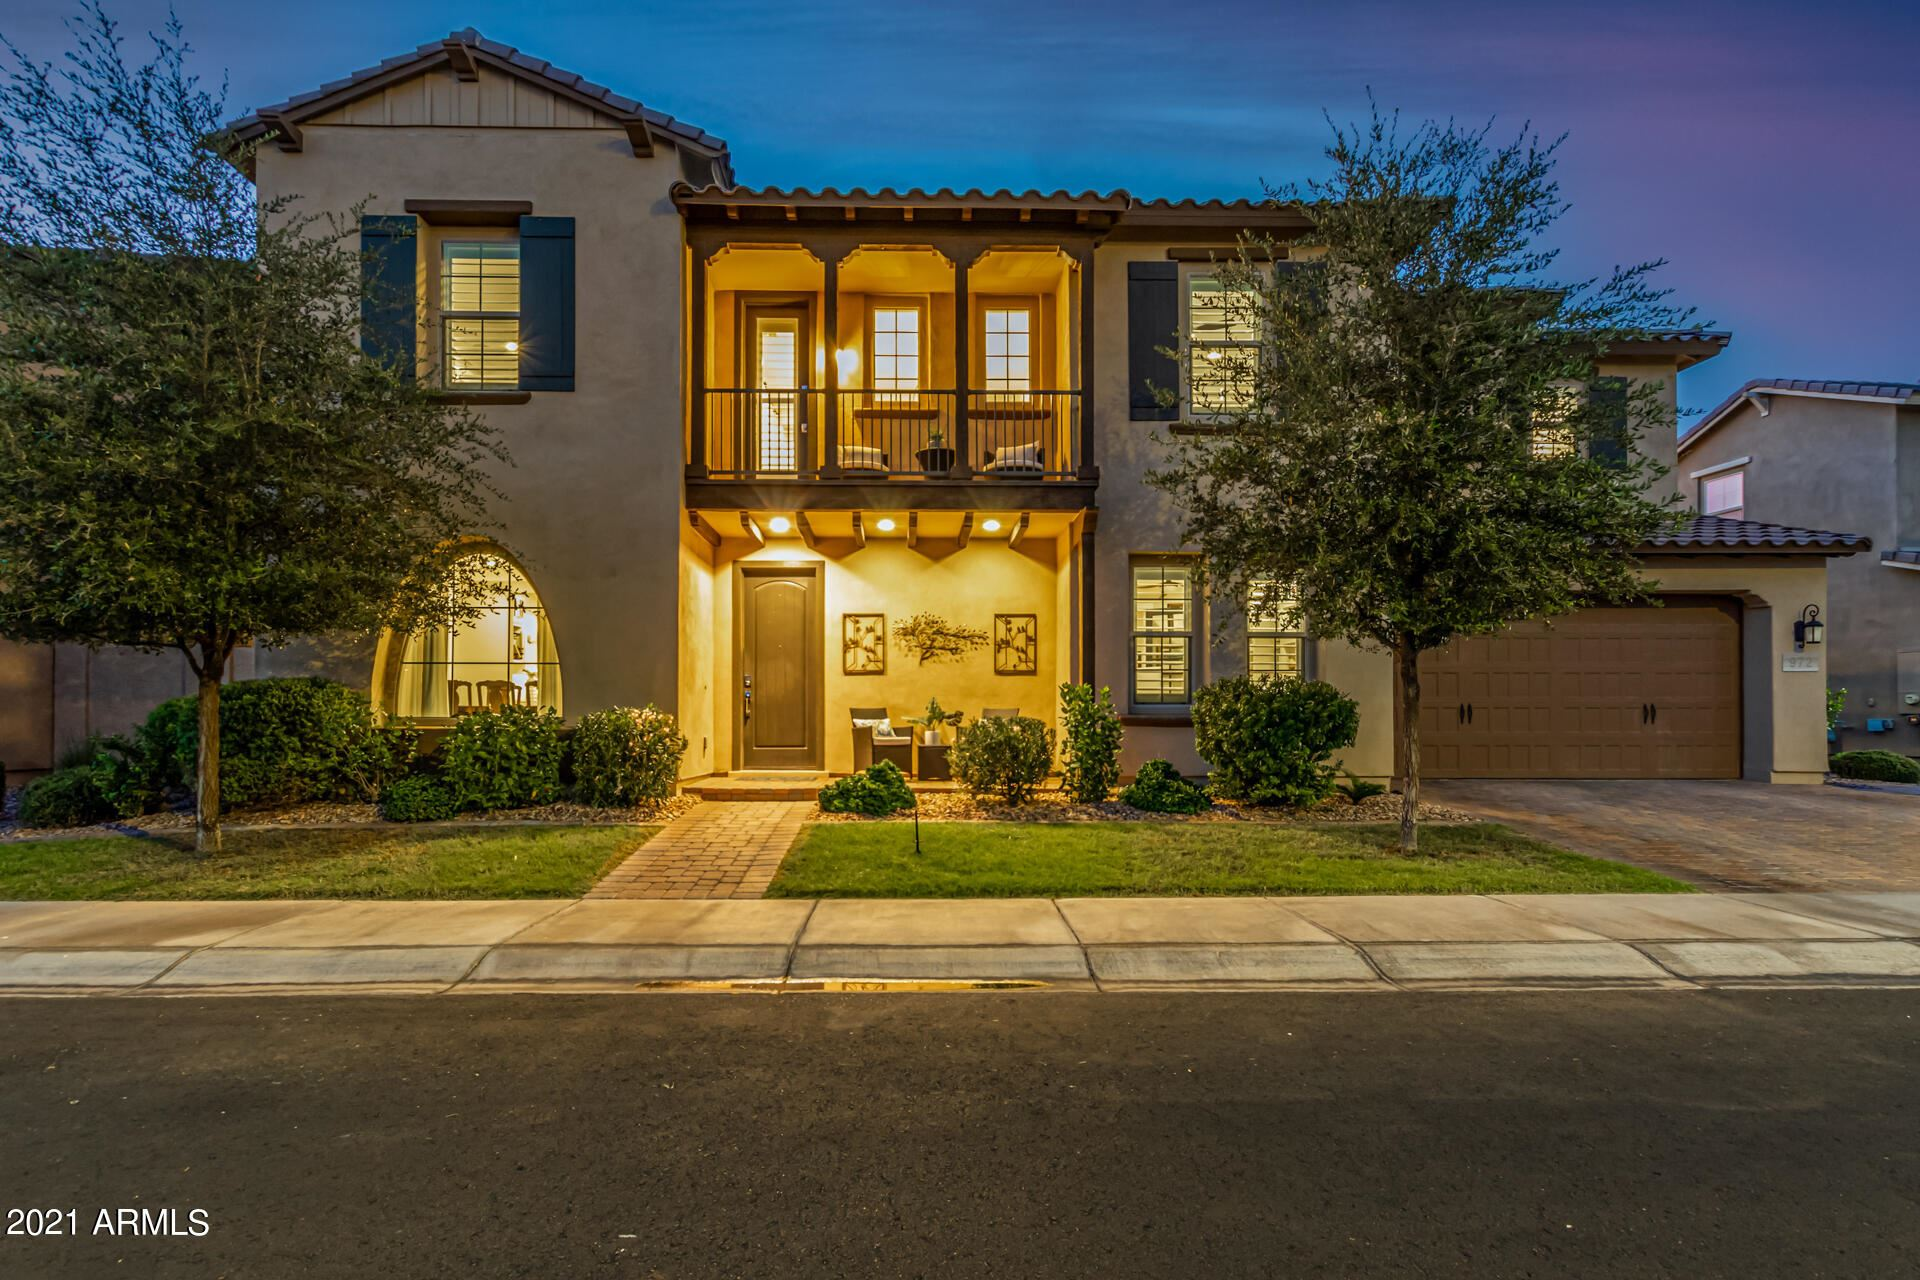 972 W KAIBAB Drive, Chandler, AZ 85248 - MLS#: 6297669